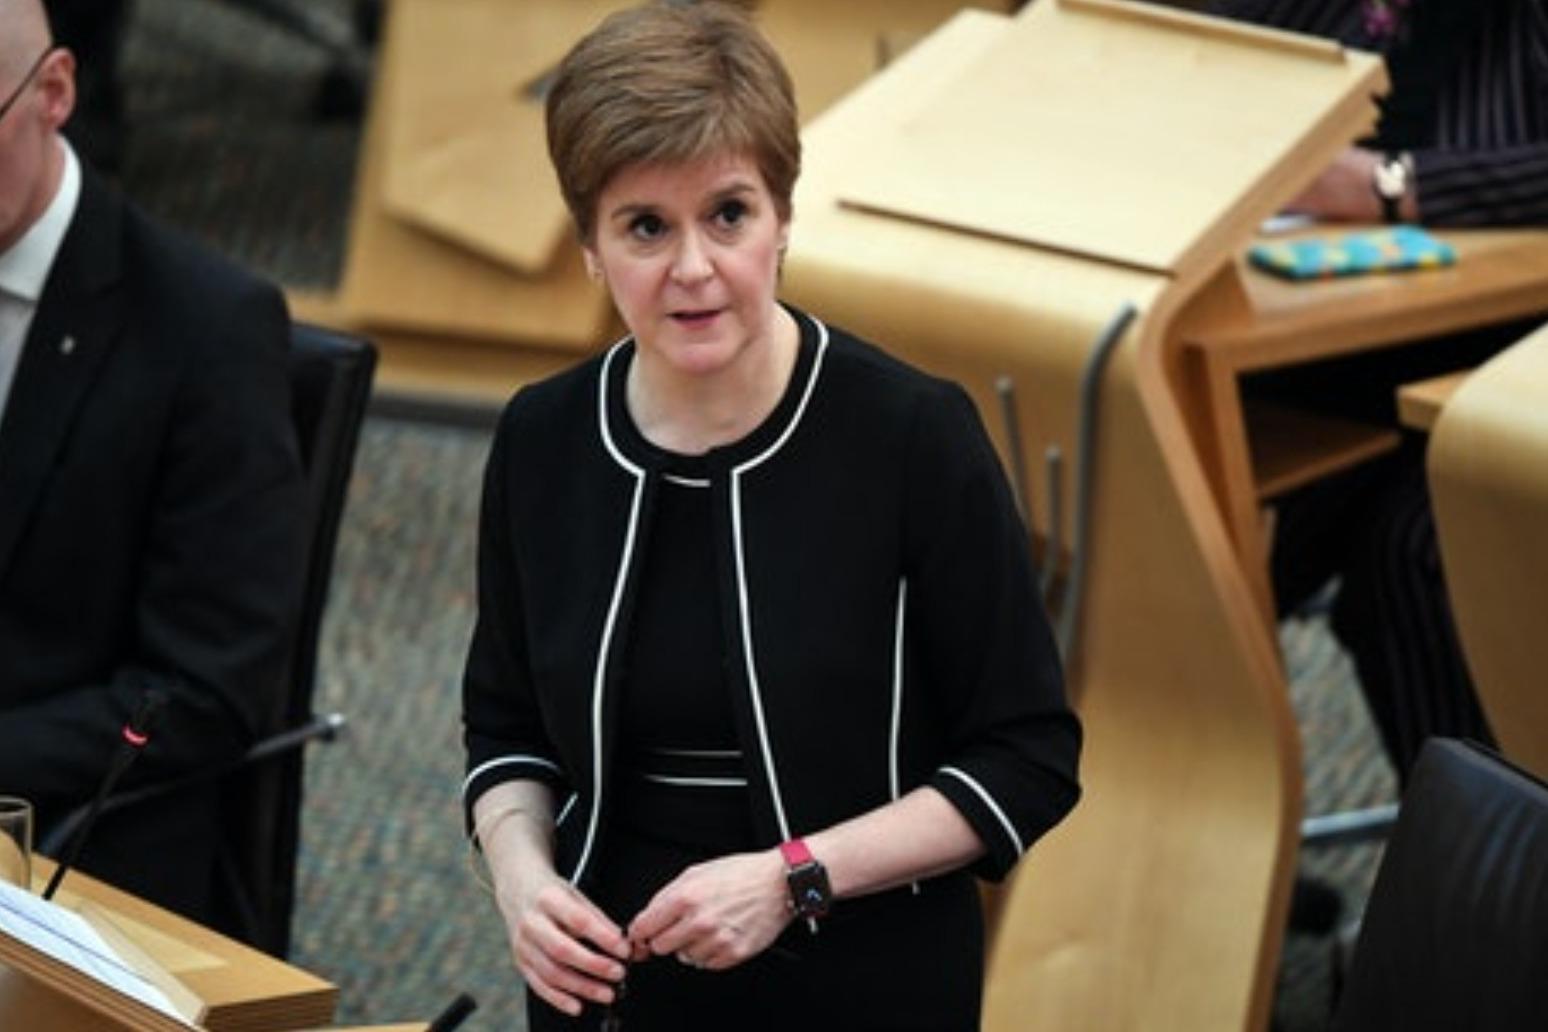 Nicola Sturgeon due to announce new coronavirus restrictions for Scotland